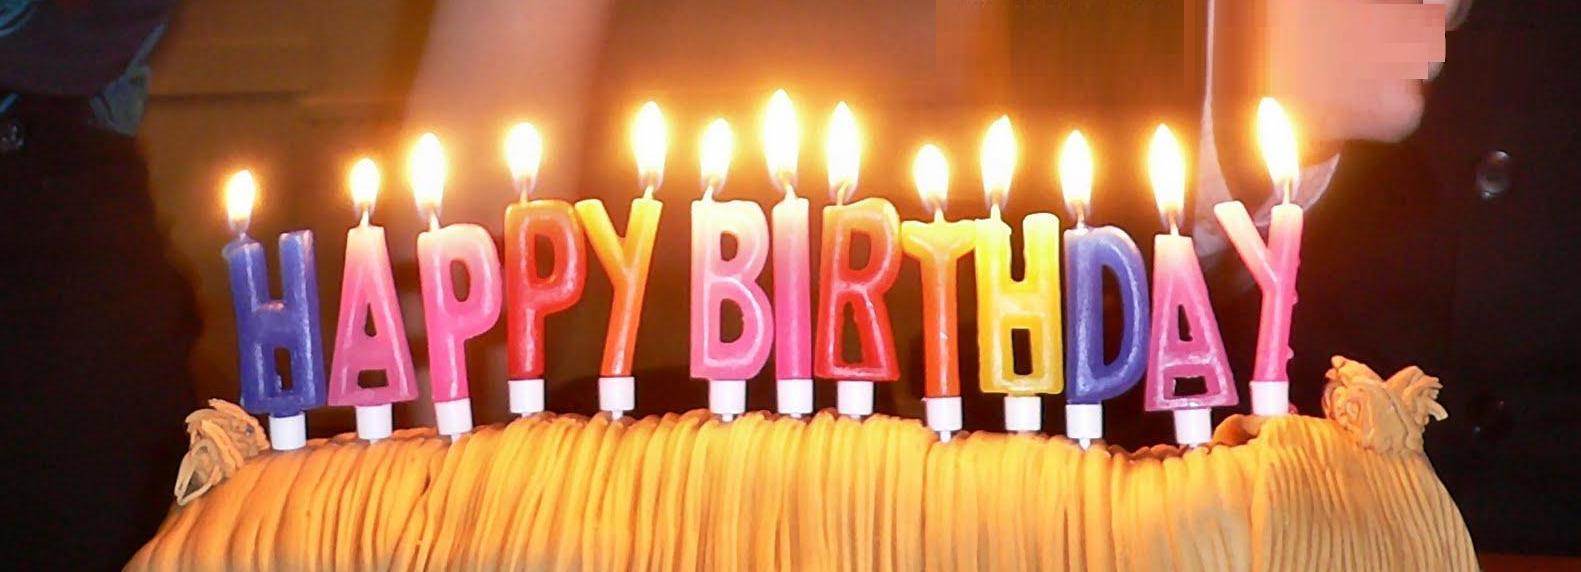 Hd wallpaper birthday - Happy Birthday Live Wallpaper Hd Wallpaper 09baf70da22438820989f0b0f2c15b2a 295d6b7d50b60c0e9fecc215ed204d42